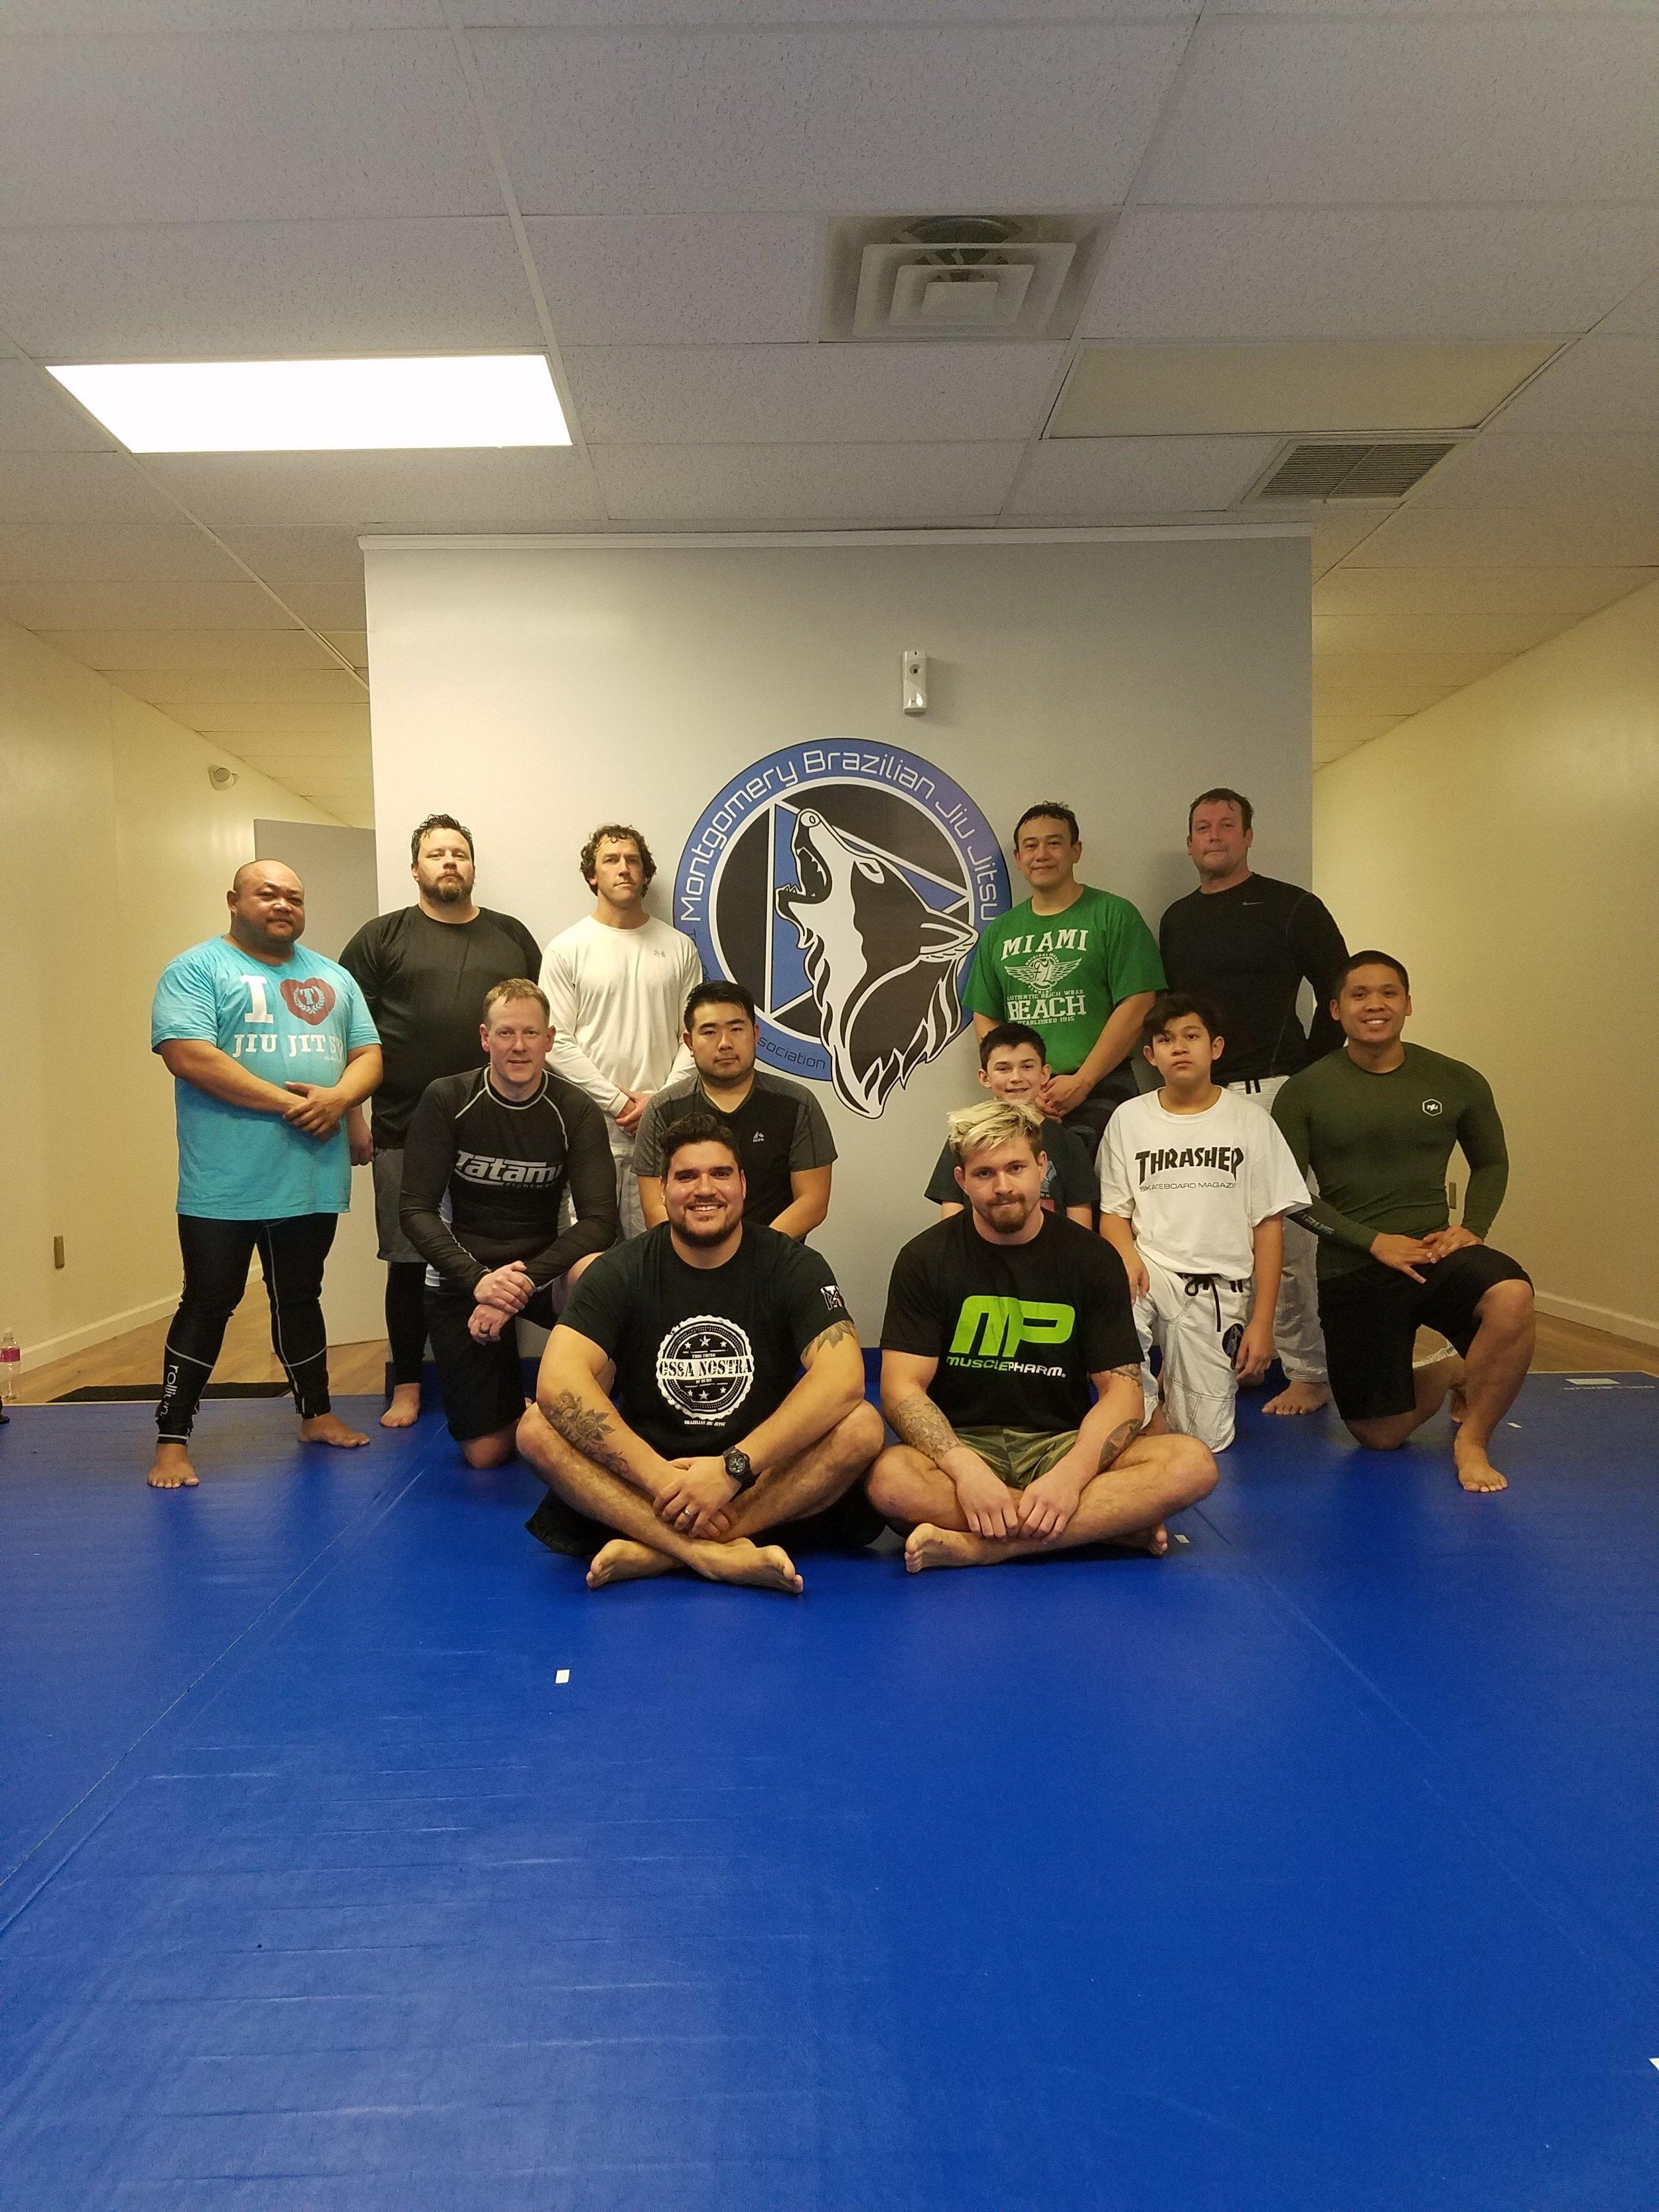 Seminar with teammate and ADCC Champion Gordon Ryan.